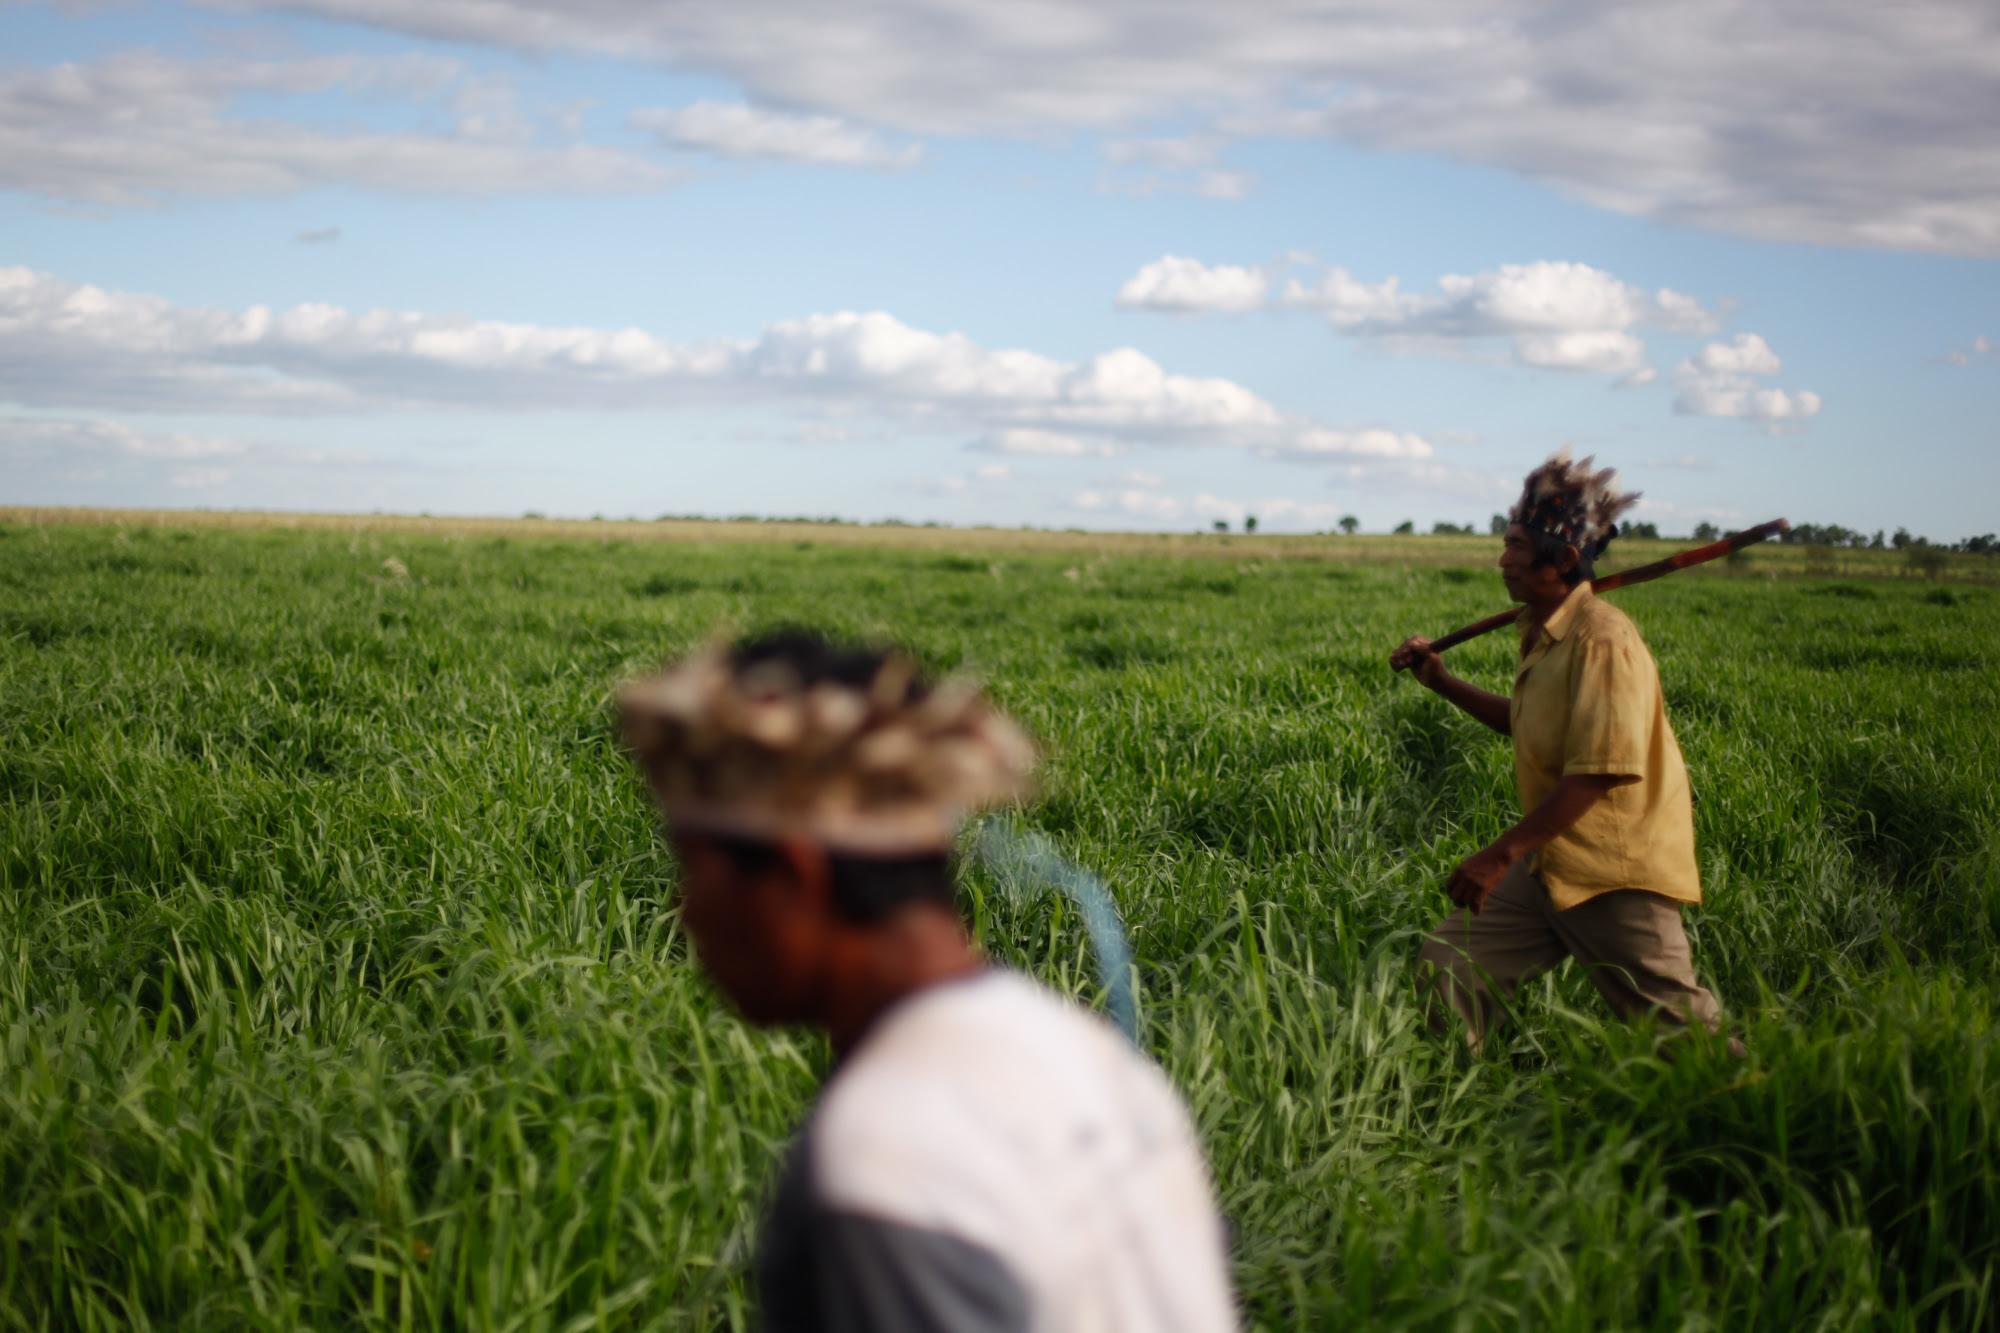 Índios da comunidade Kurusu Ambá, onde predomina a cultura da soja. Foto de Ruy Sposati